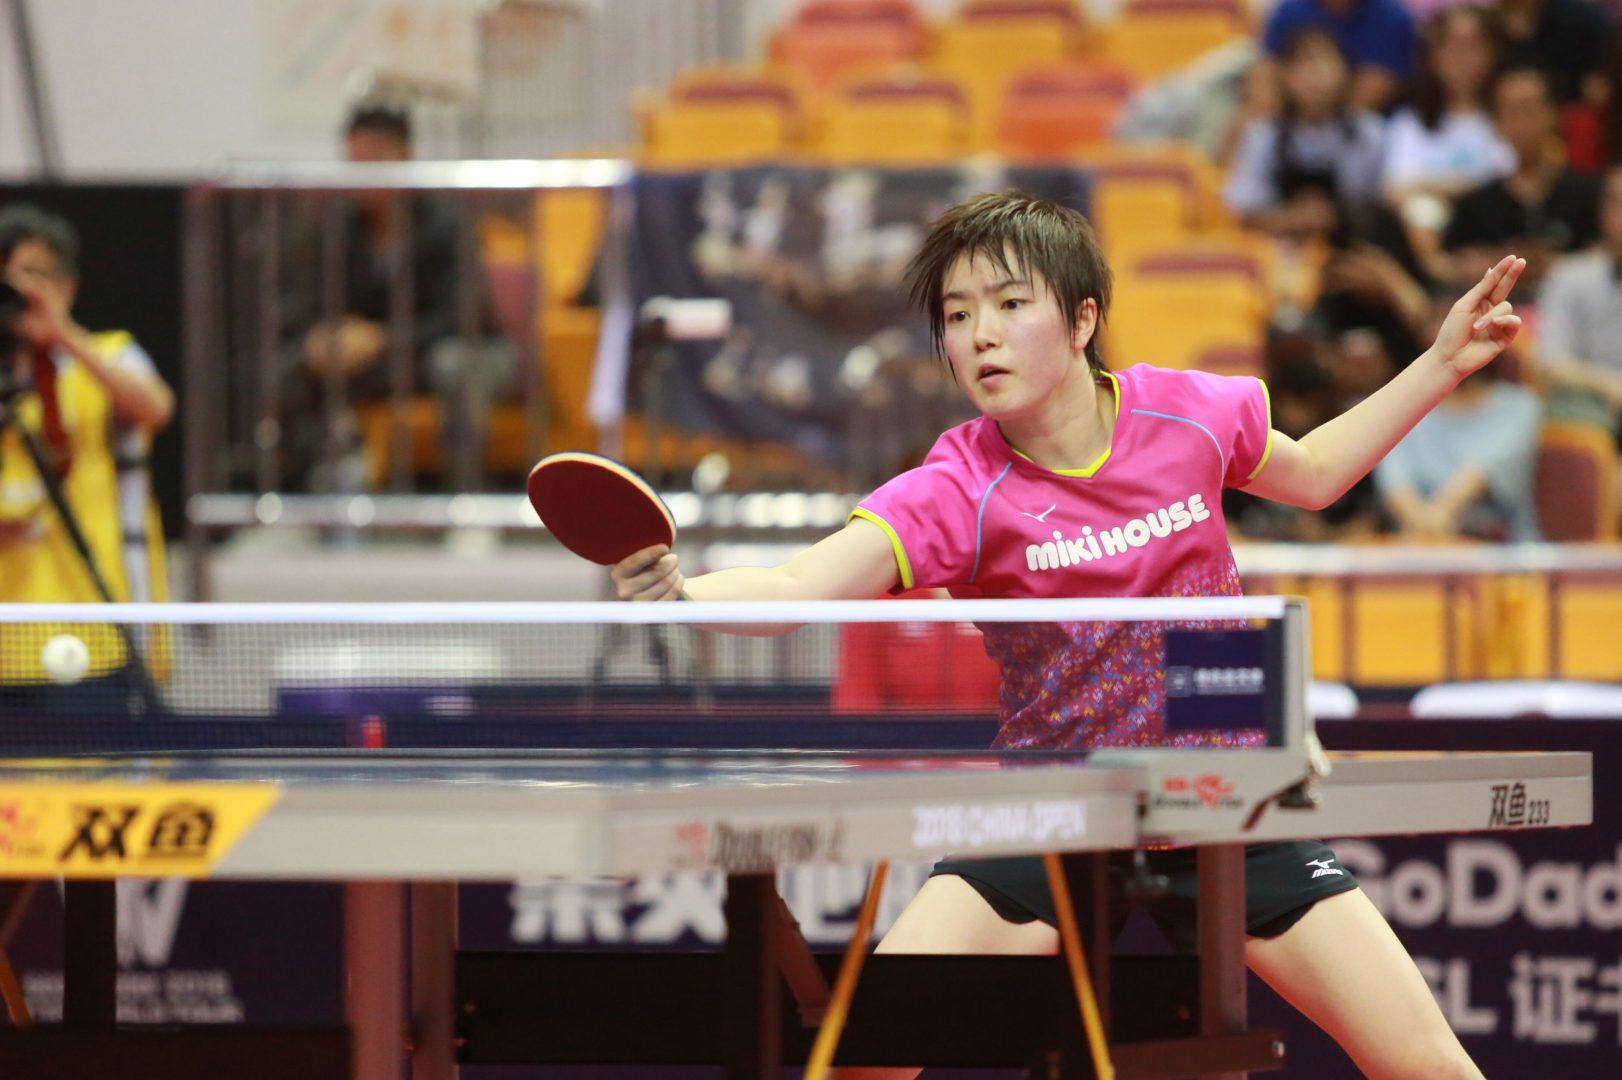 浜本由惟・芝田沙季が中国上位陣に勝利【卓球・ITTF中国オープン女子4日目の結果】